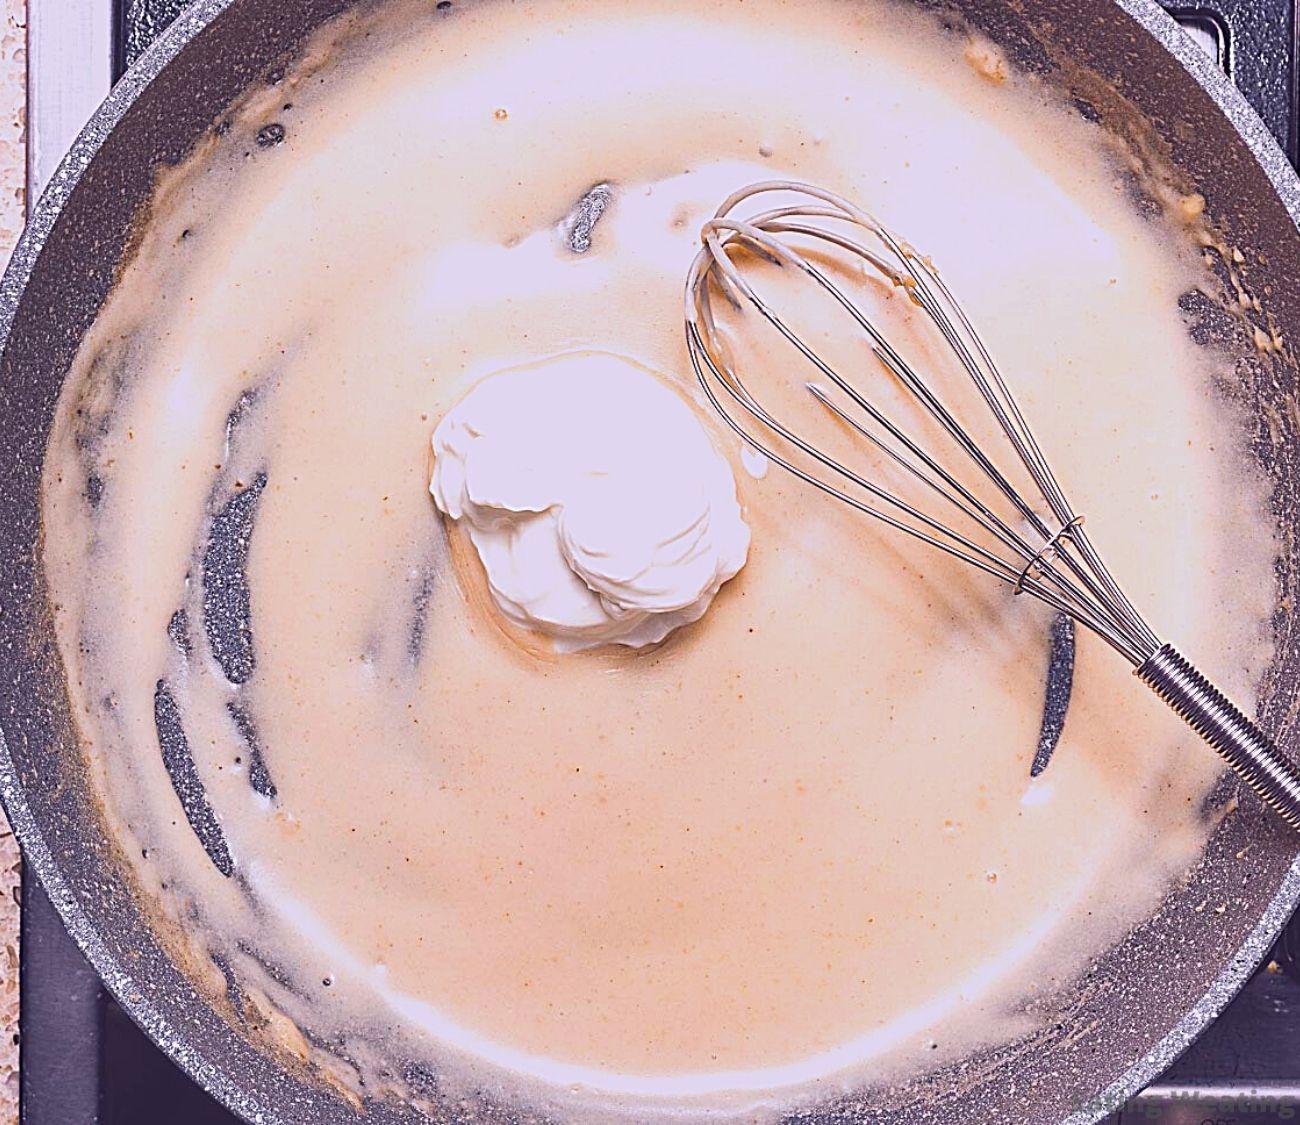 Sour Cream and Onion Pasta